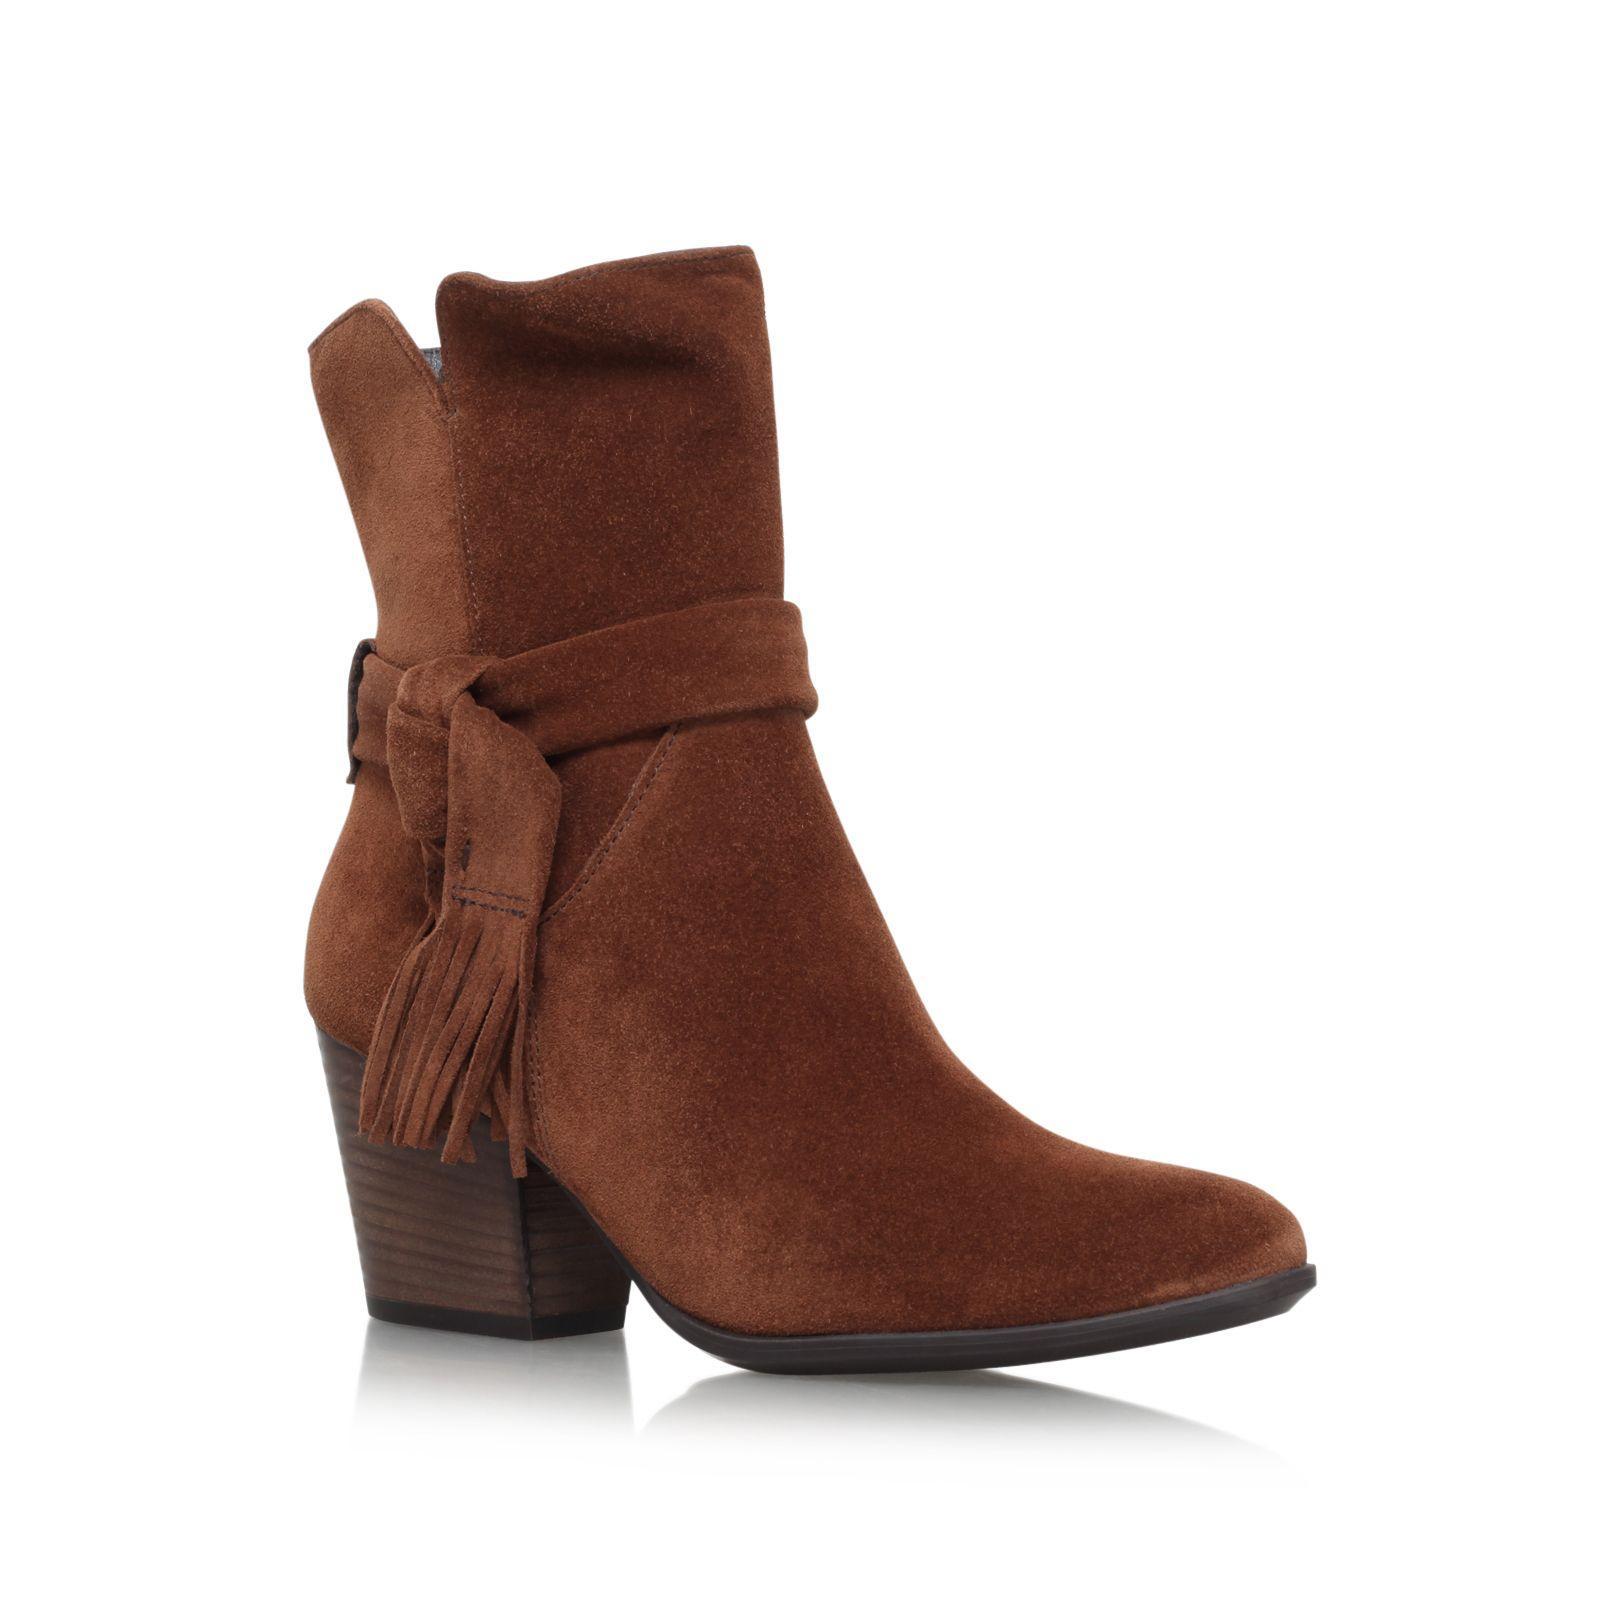 lyst paul green lindsay high heel ankle boots in brown. Black Bedroom Furniture Sets. Home Design Ideas